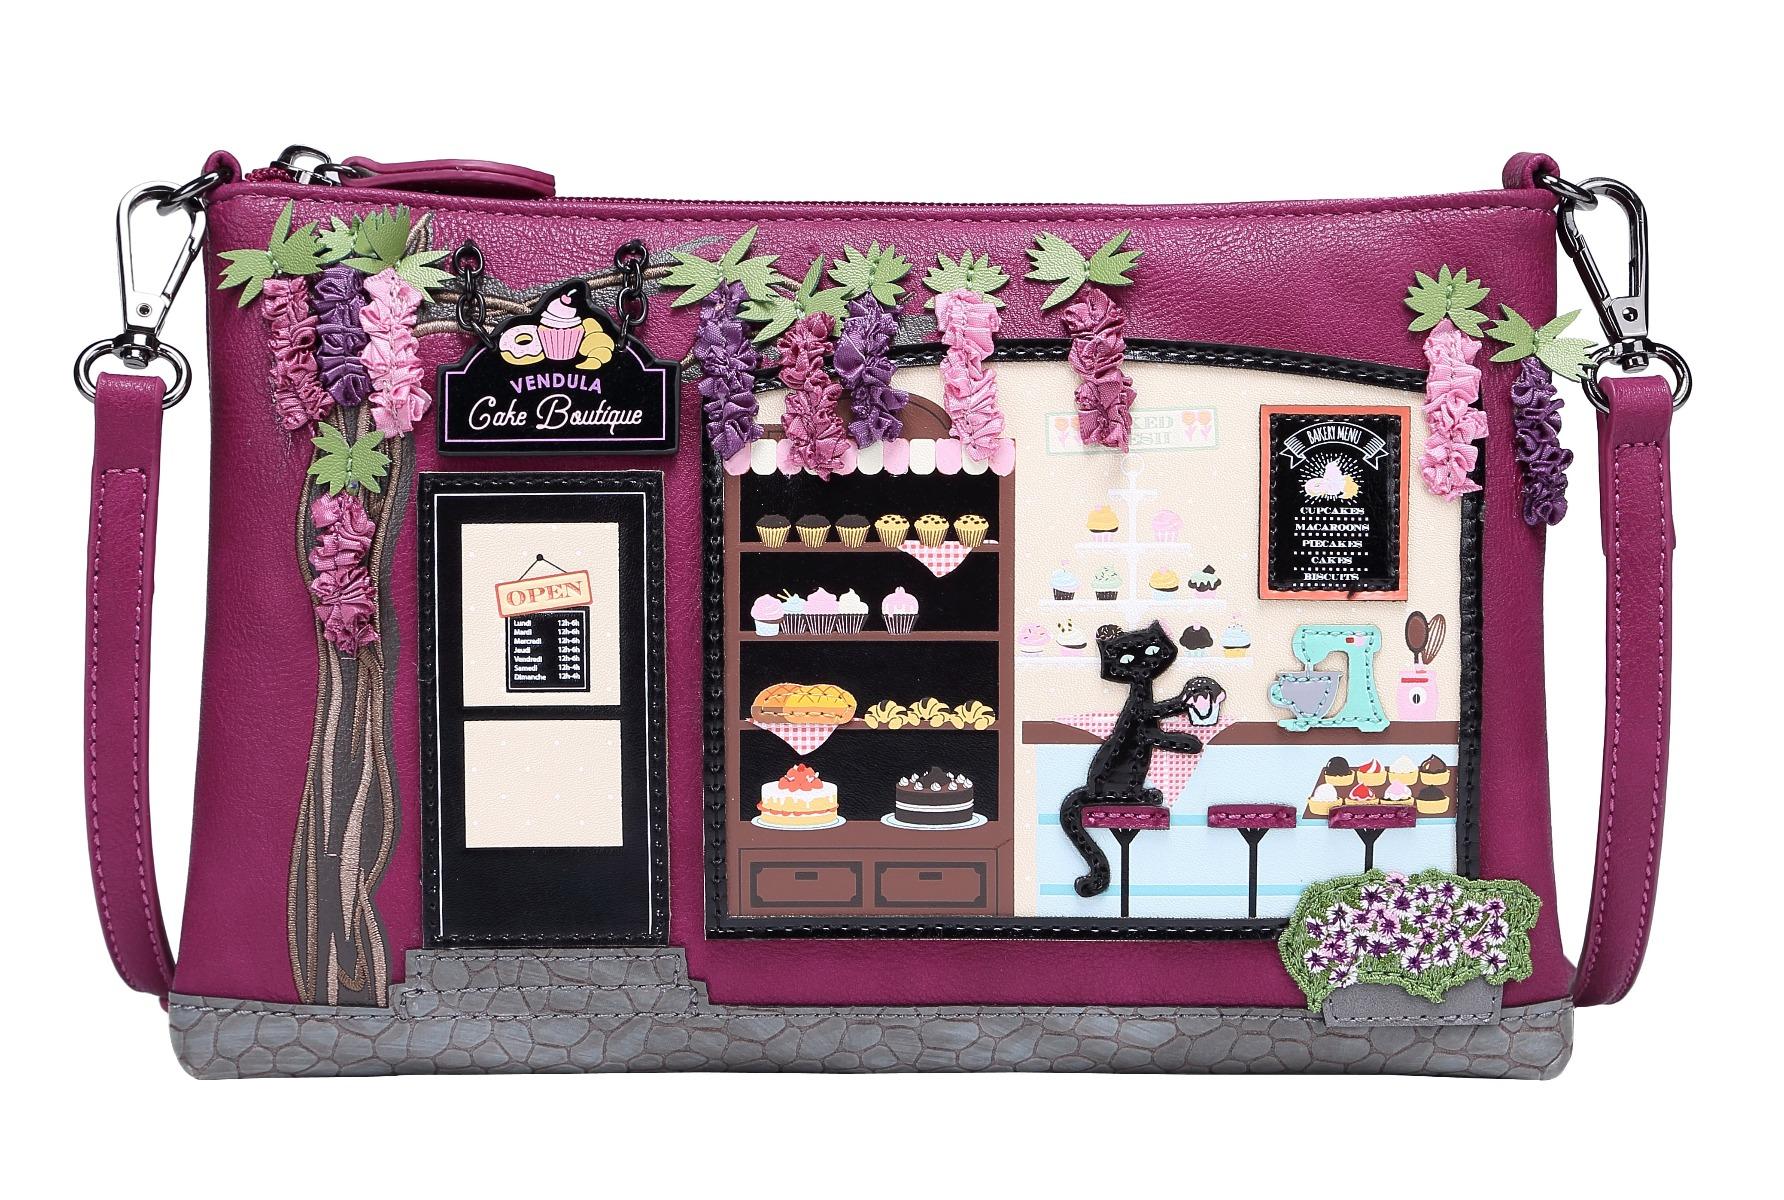 Bolso Clutch Cake Boutique, de Vendula London